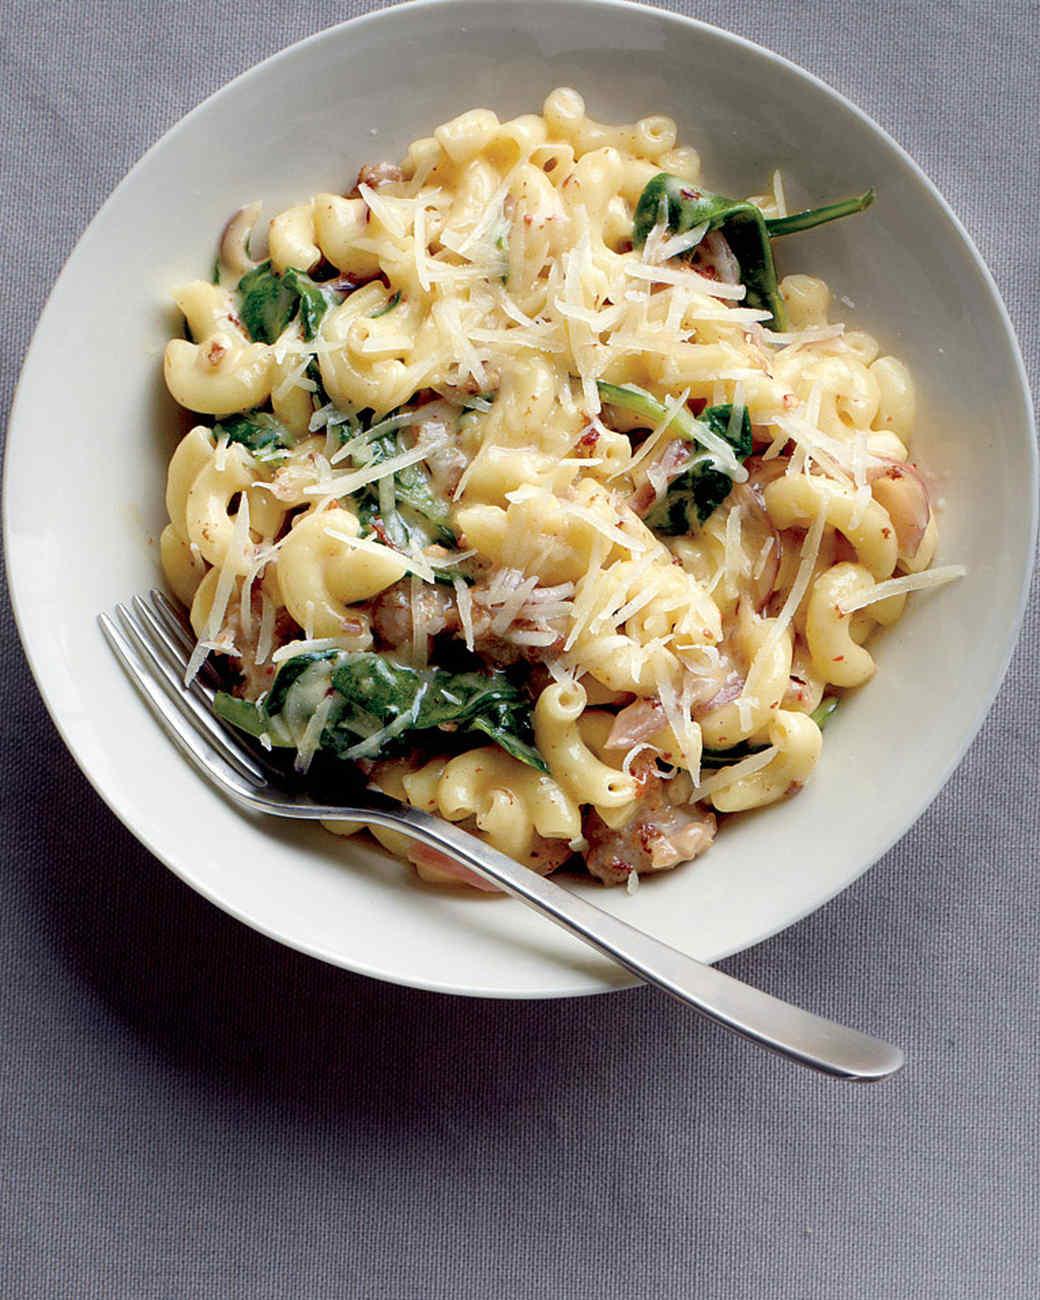 macaroni-sausage-spinach-med107508.jpg